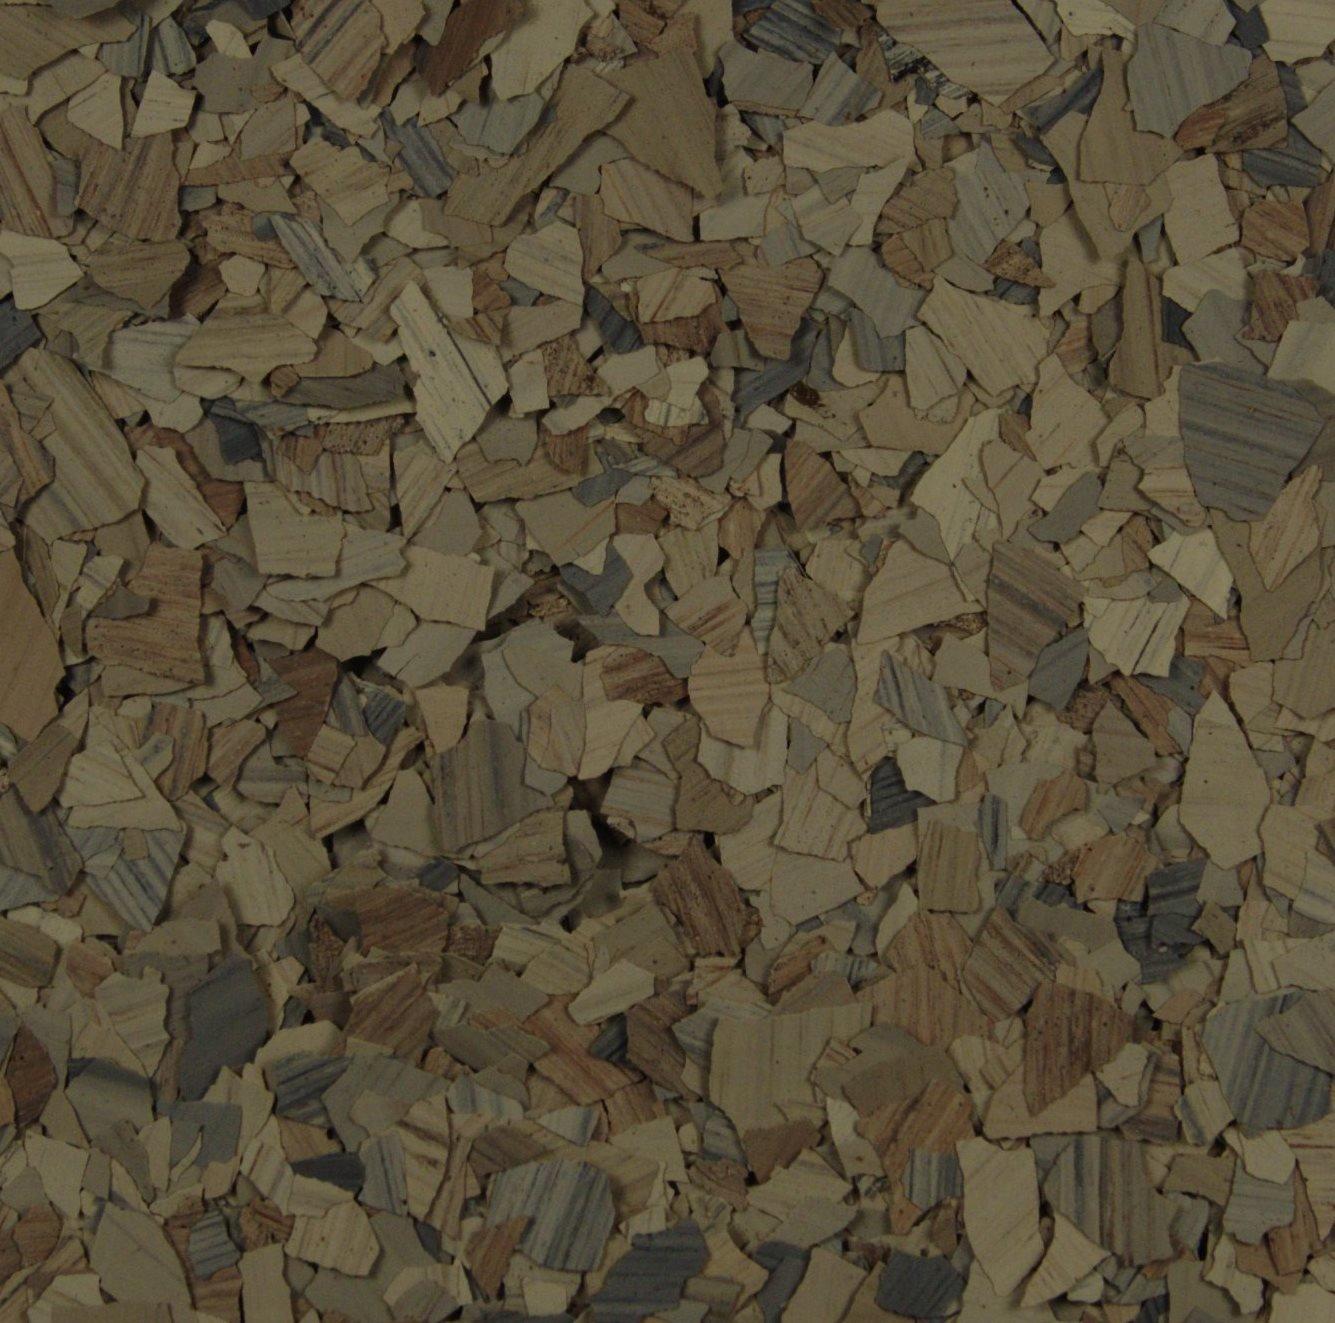 American Abrasive Supply, Vinyl Chip Blend Garnet (Stone) 1/4'', VCPGARNS